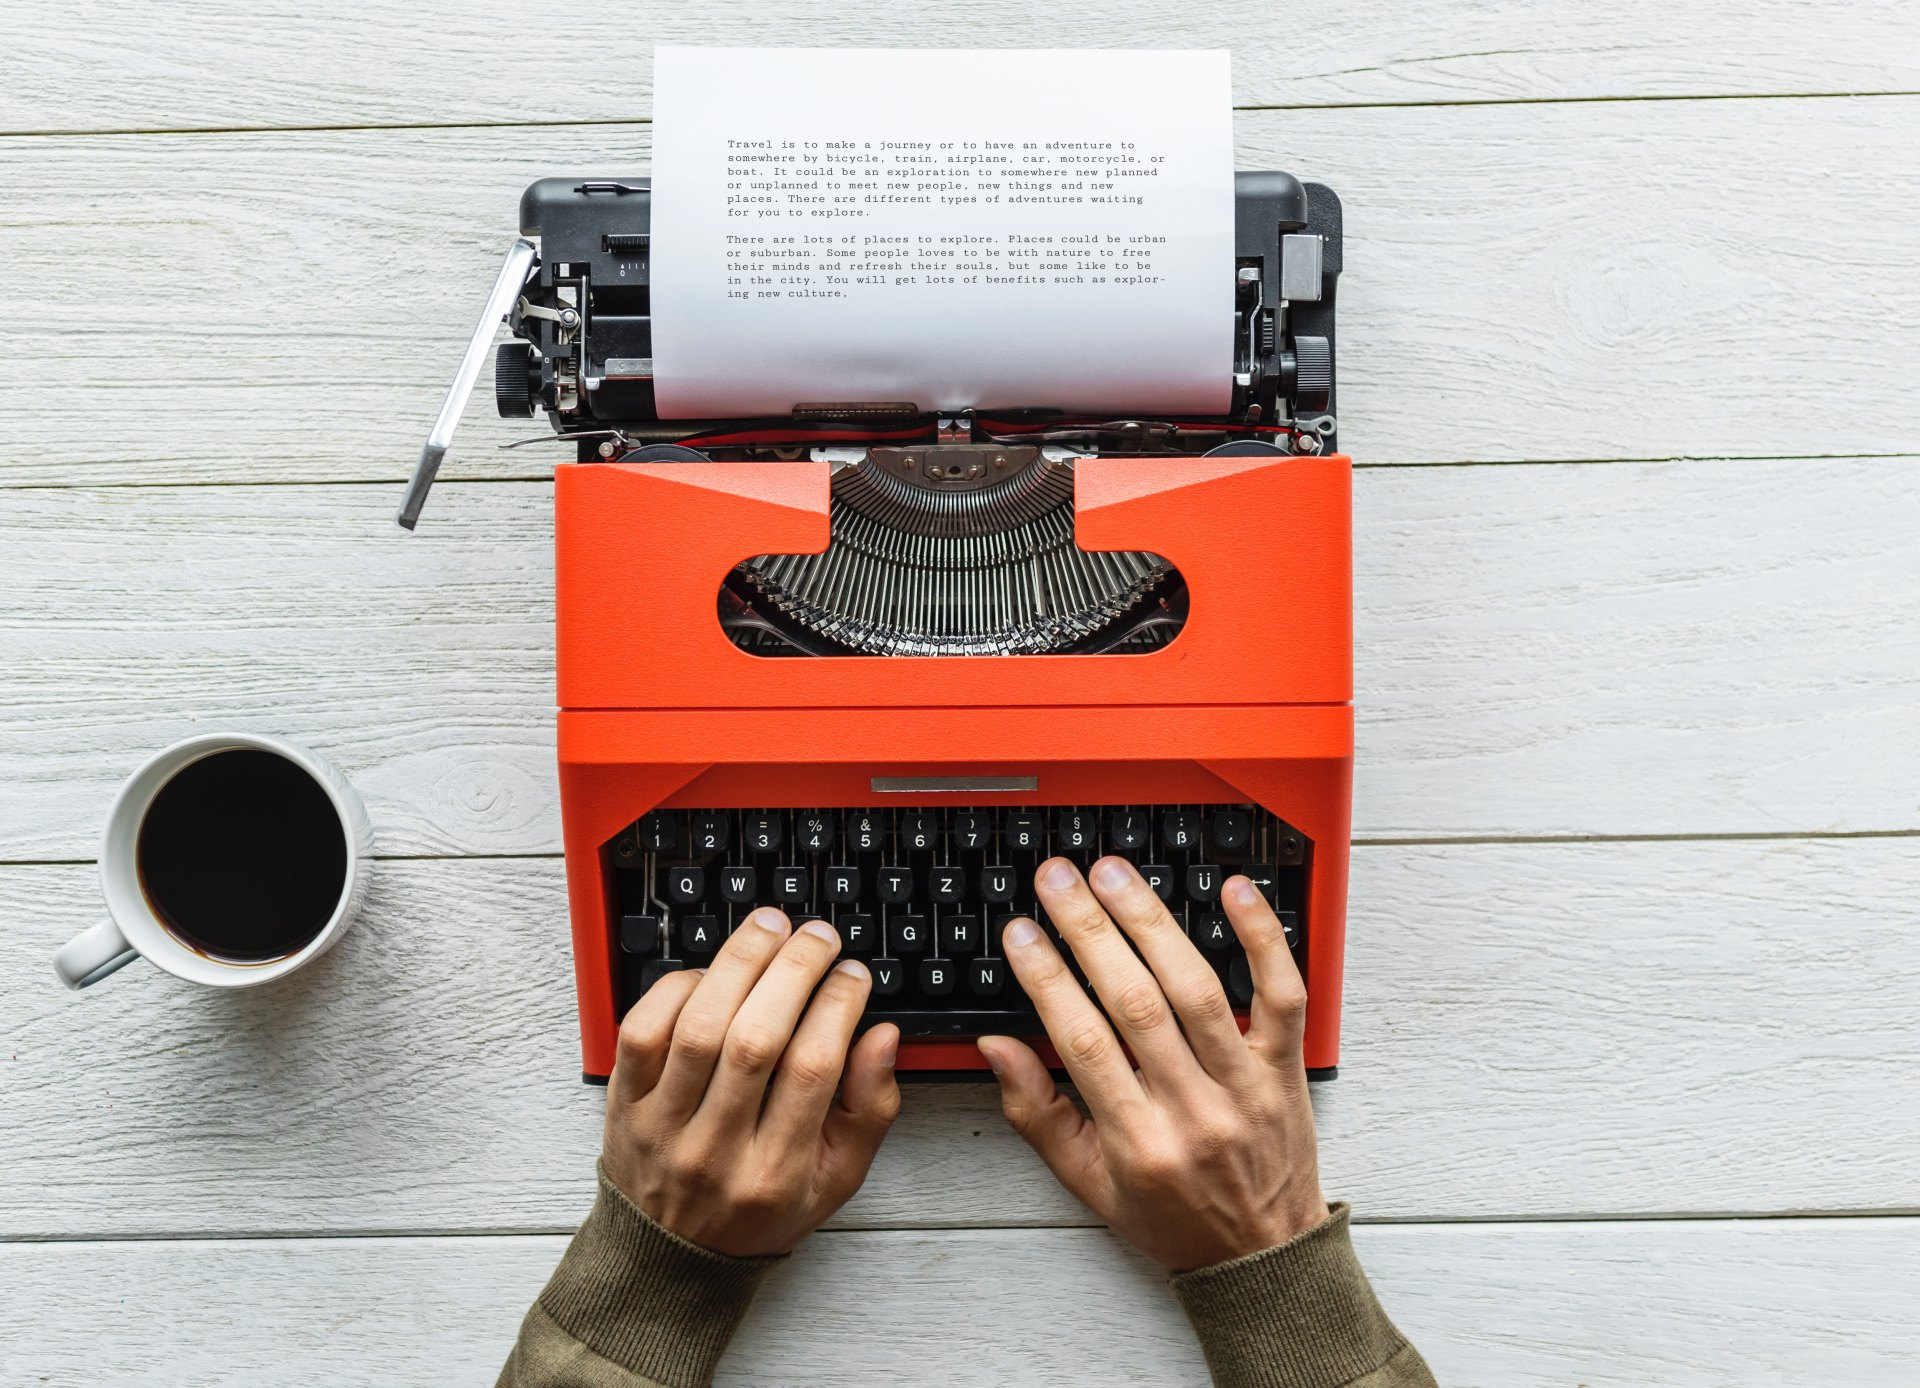 Ecrire à la machine